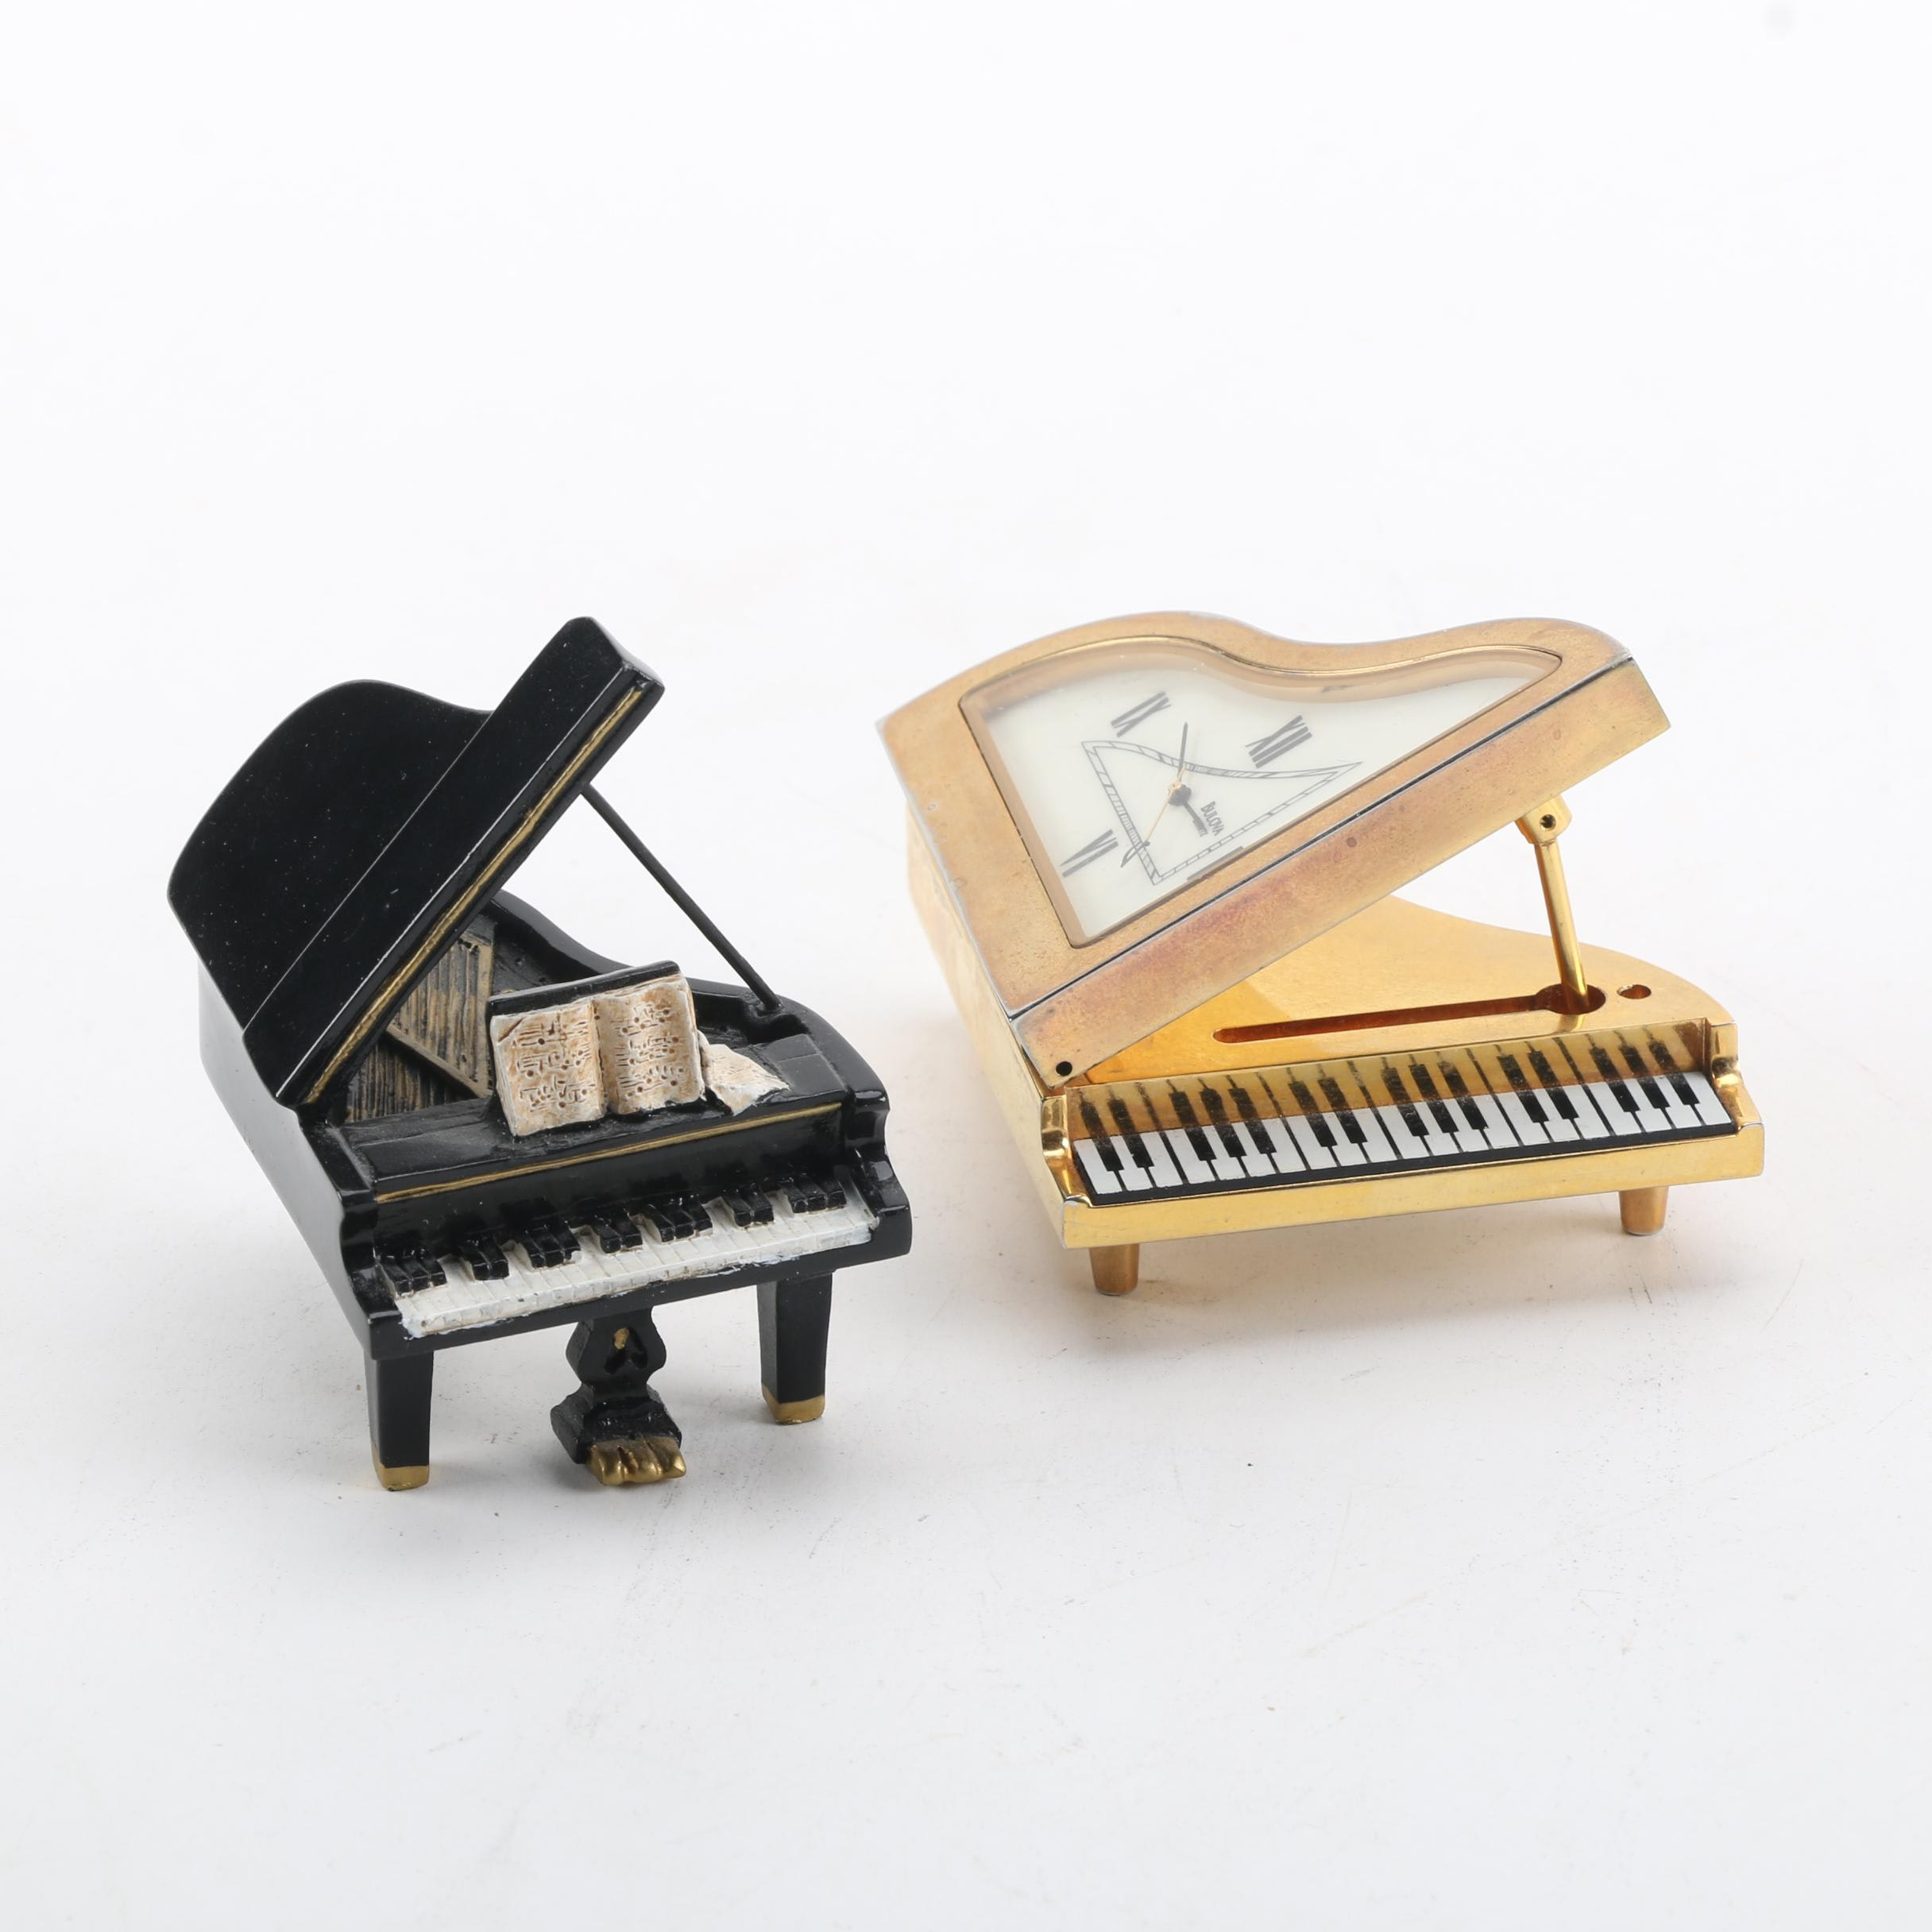 Bulova Piano Clock and Piano Figurine